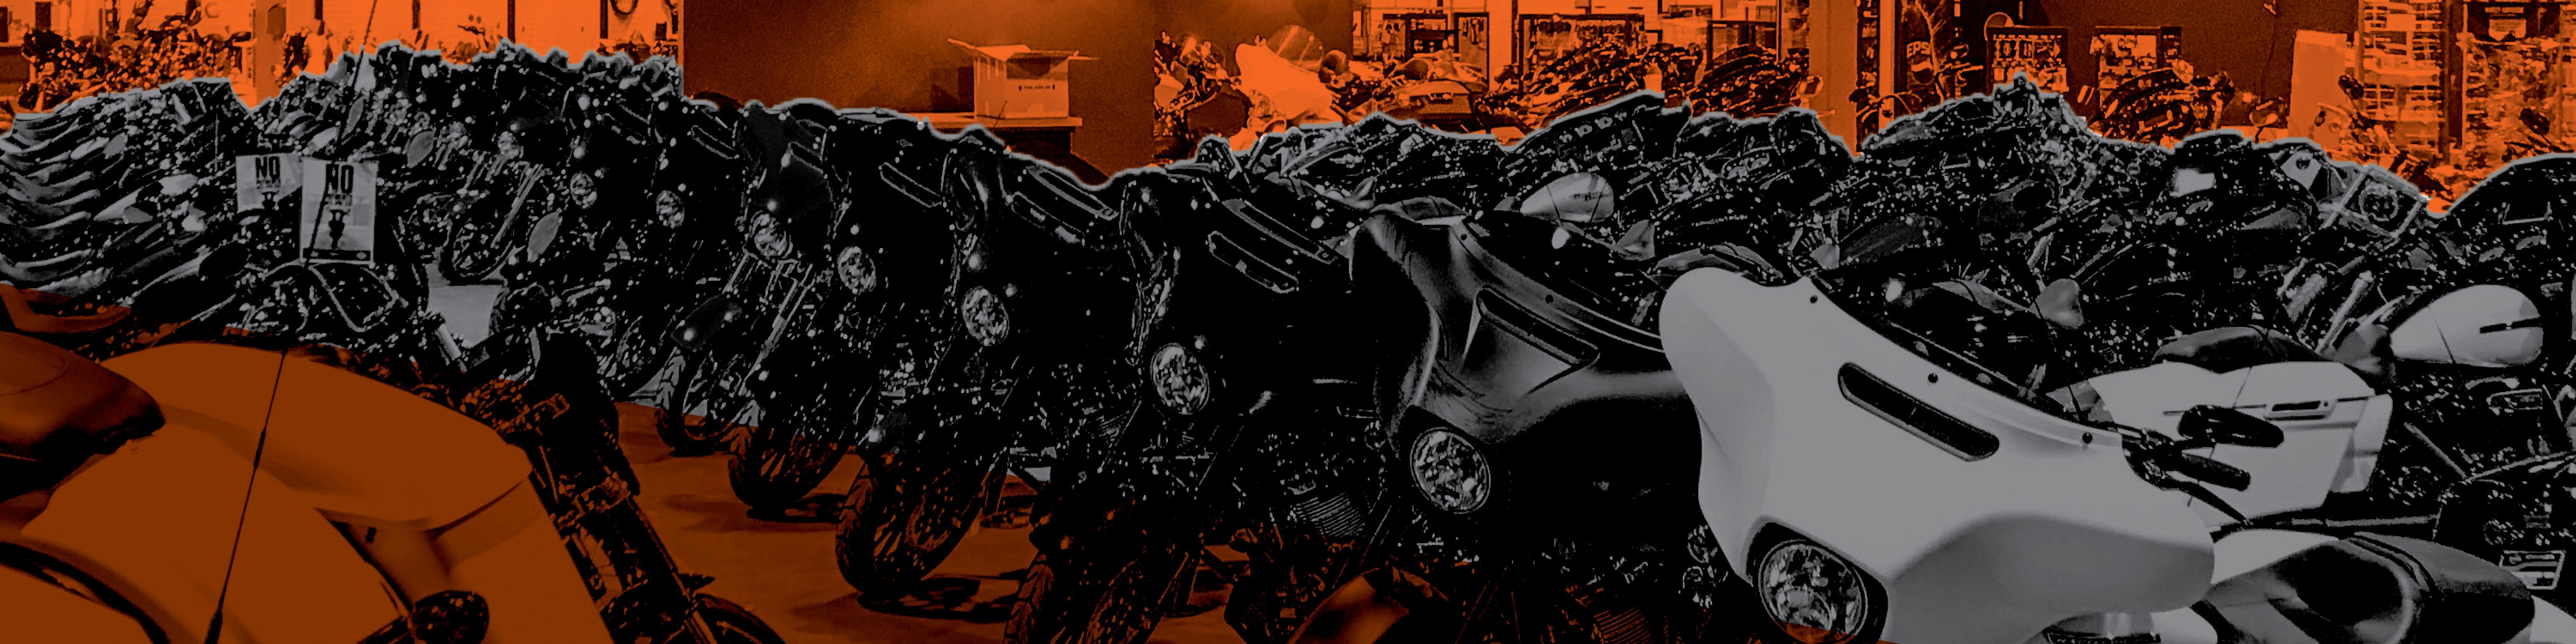 Harley-Davidson motorcycle showroom